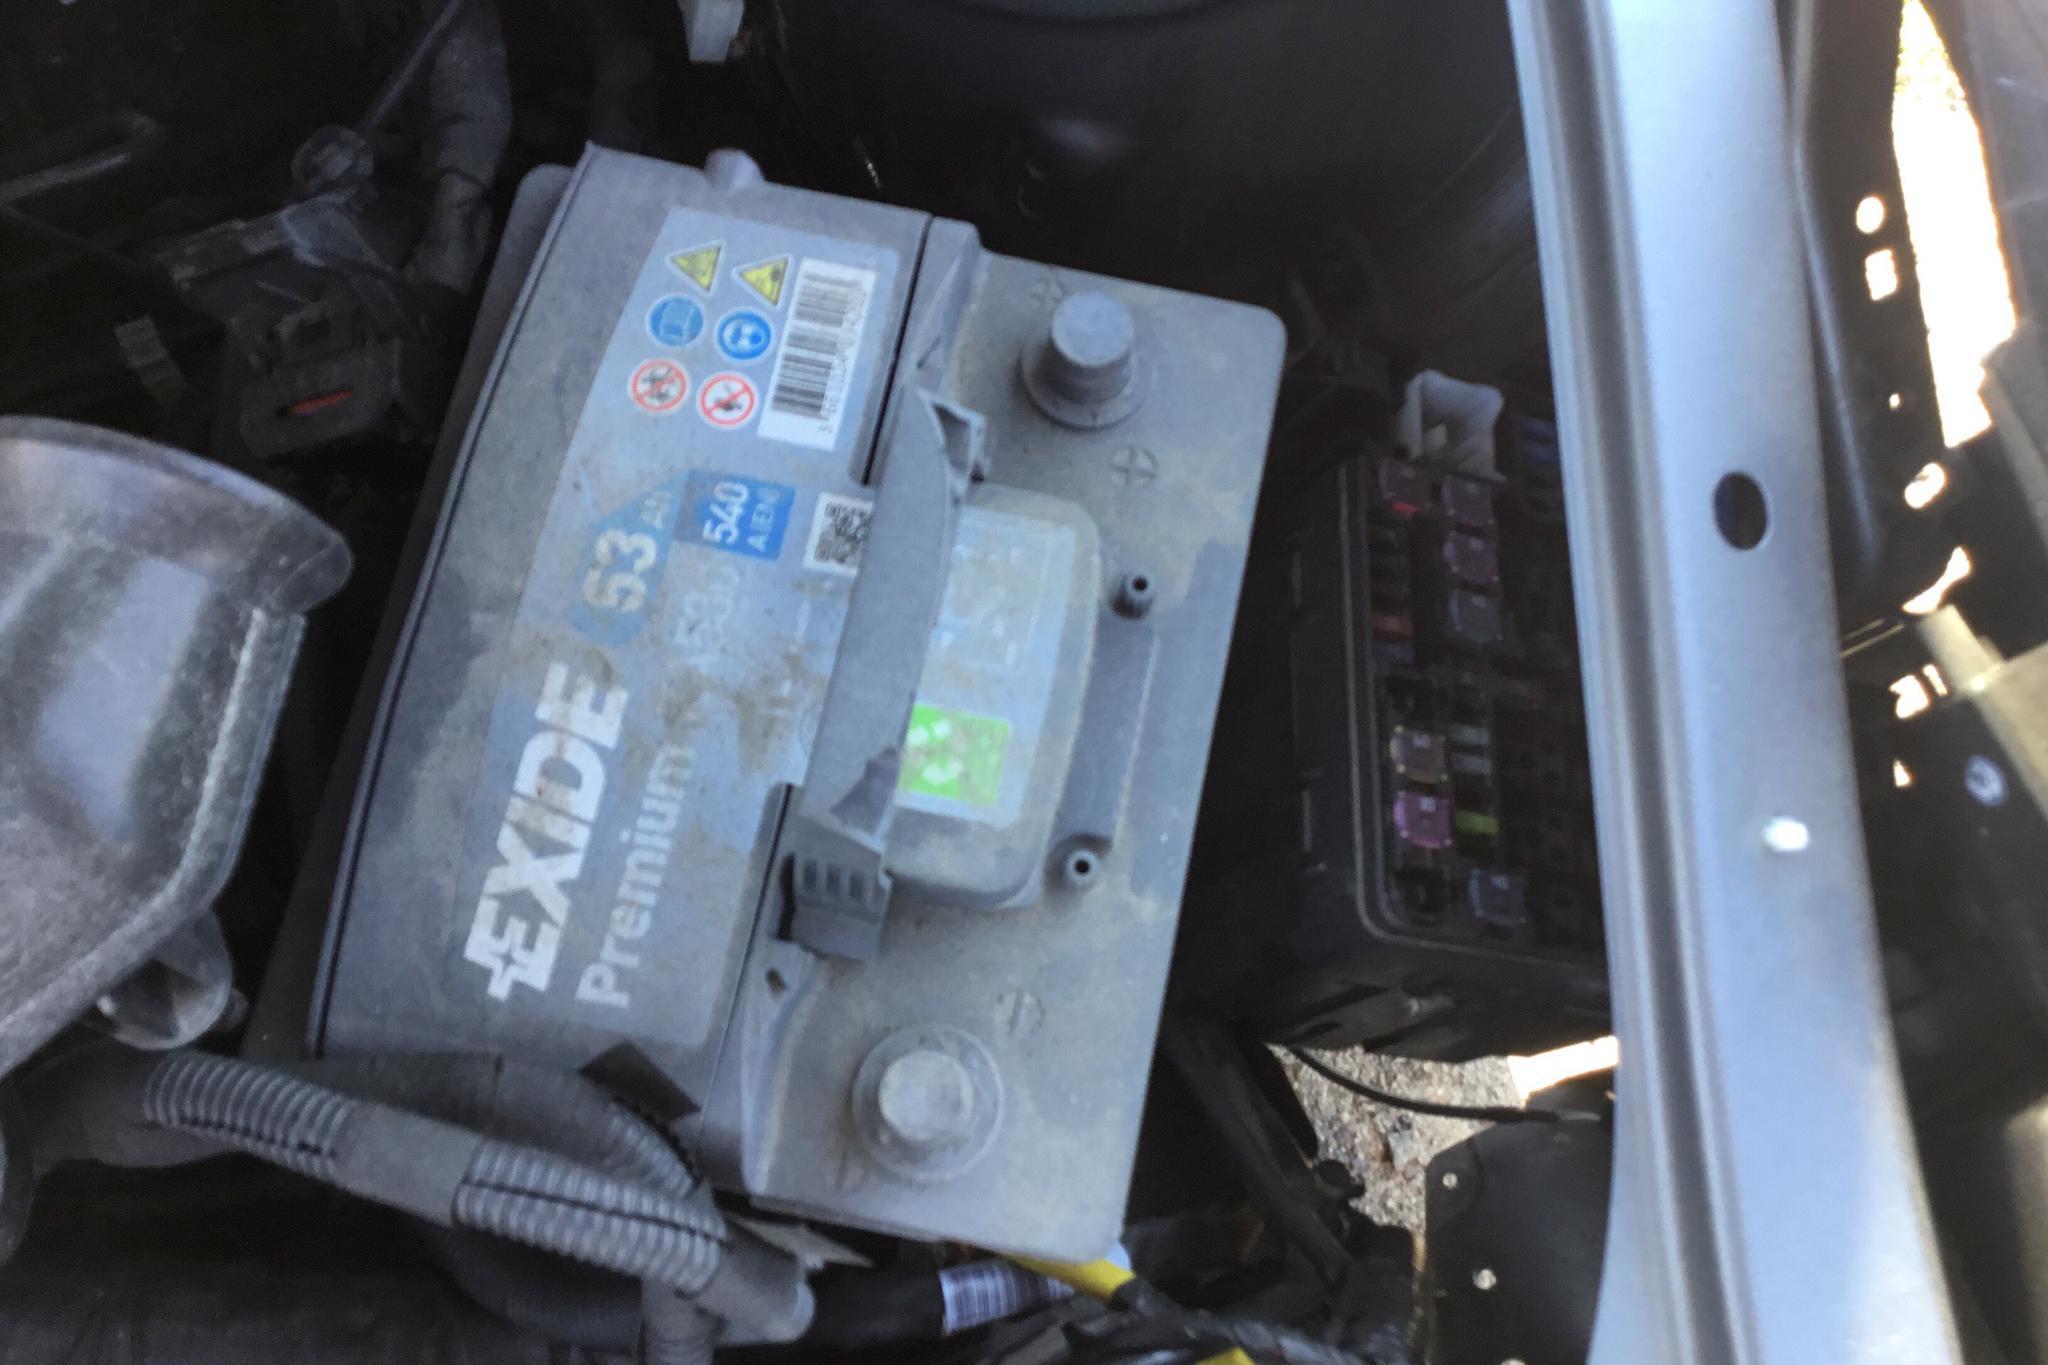 Suzuki Swift 1.2 4x4 5dr (94hk) - 35 350 km - Manual - Dark Grey - 2015